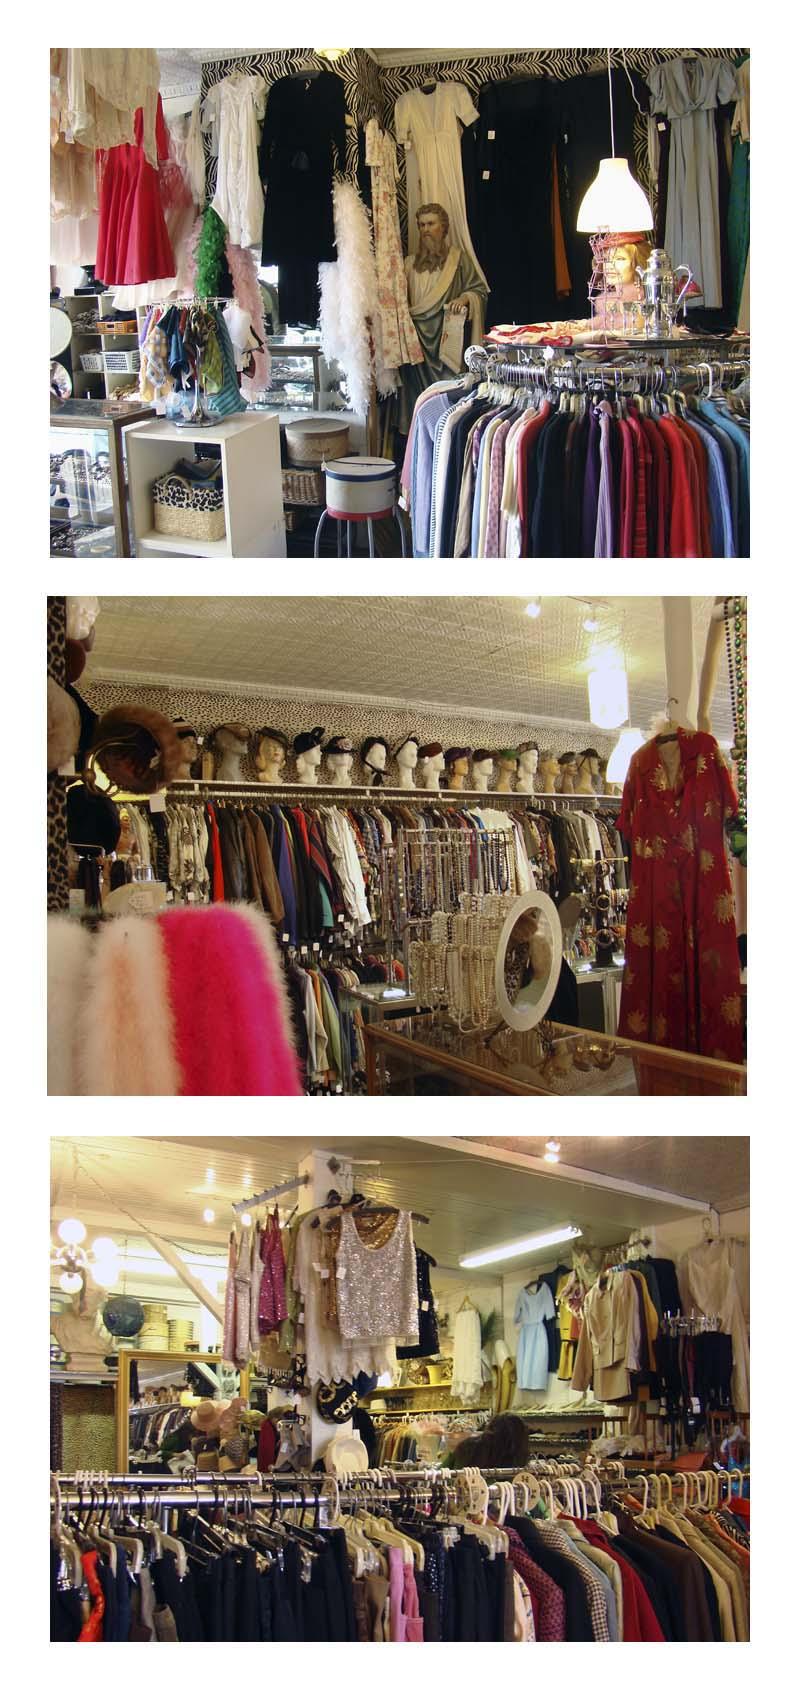 Bananas vintage thrift shop, main street, Gloucester